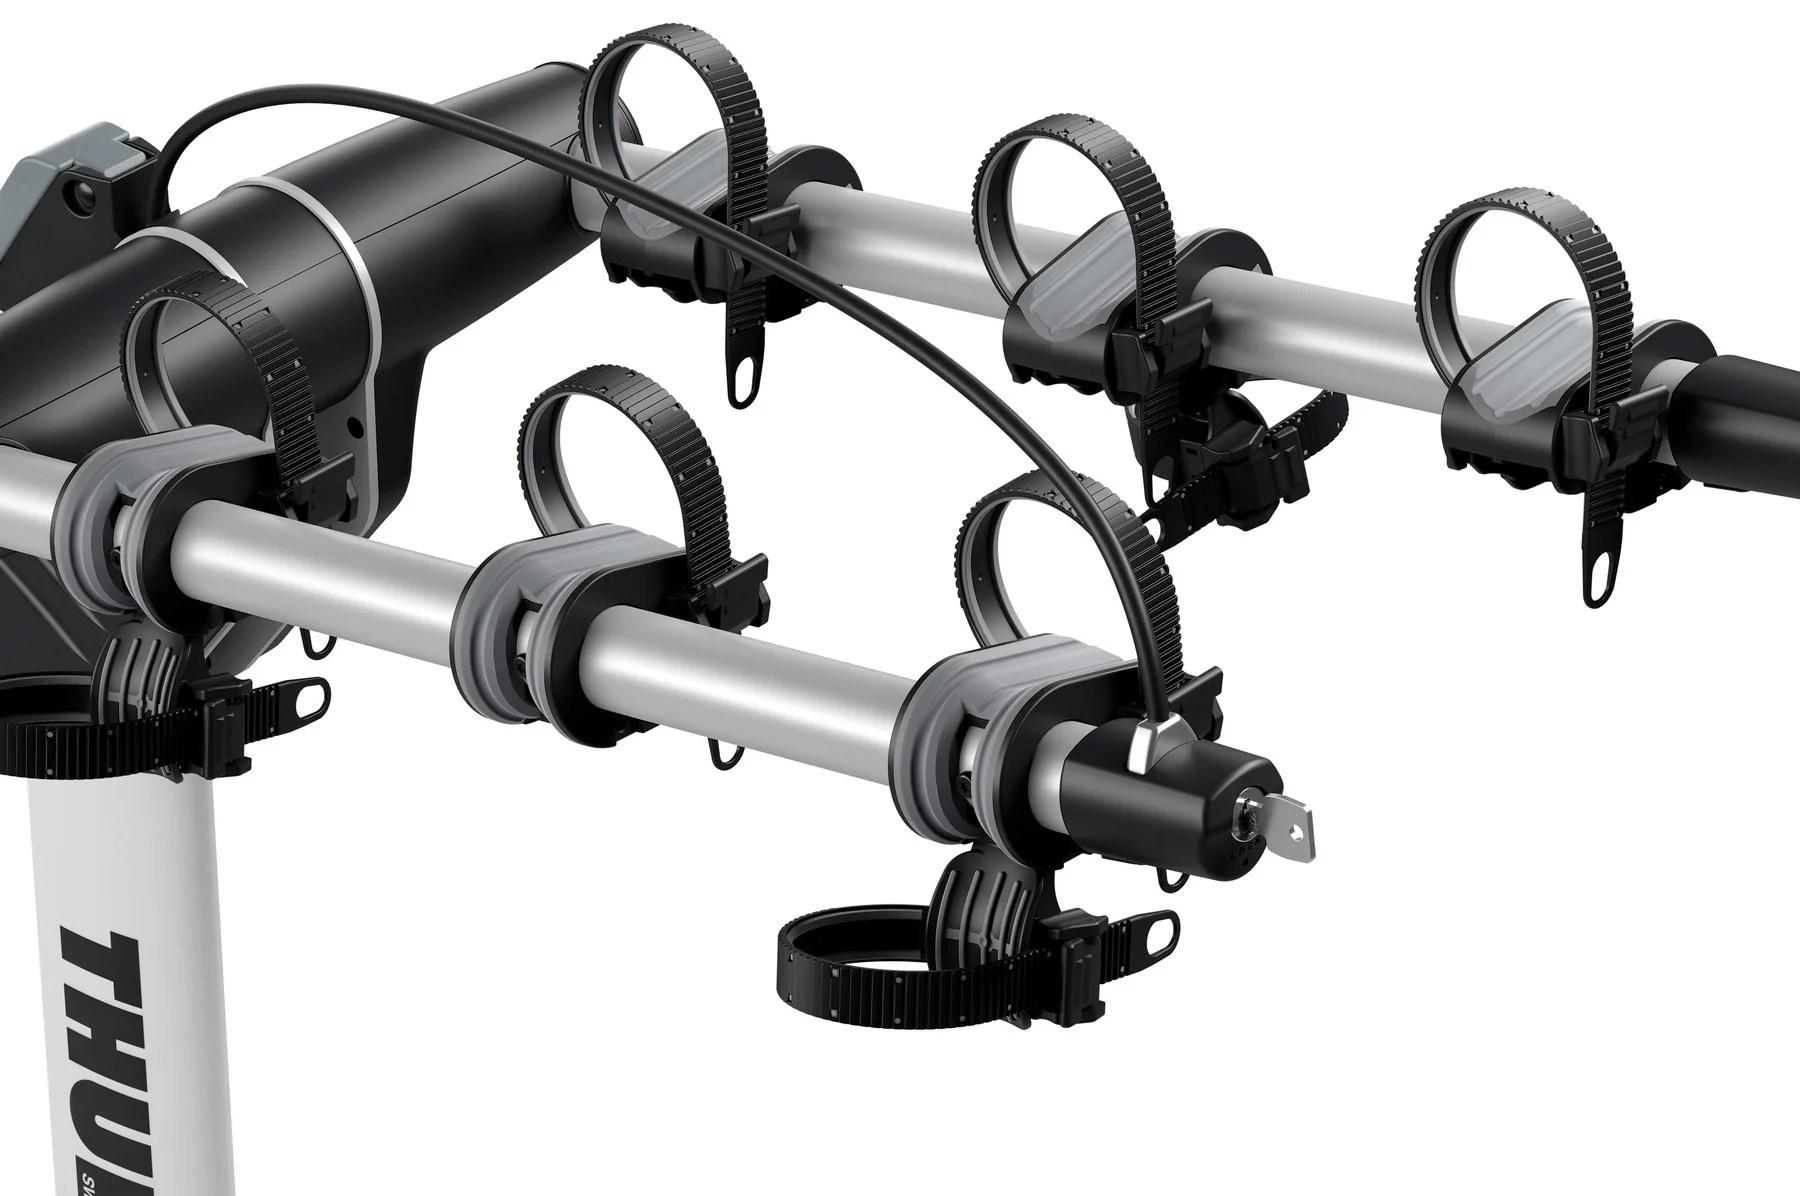 hitch mounted light weight bike racks